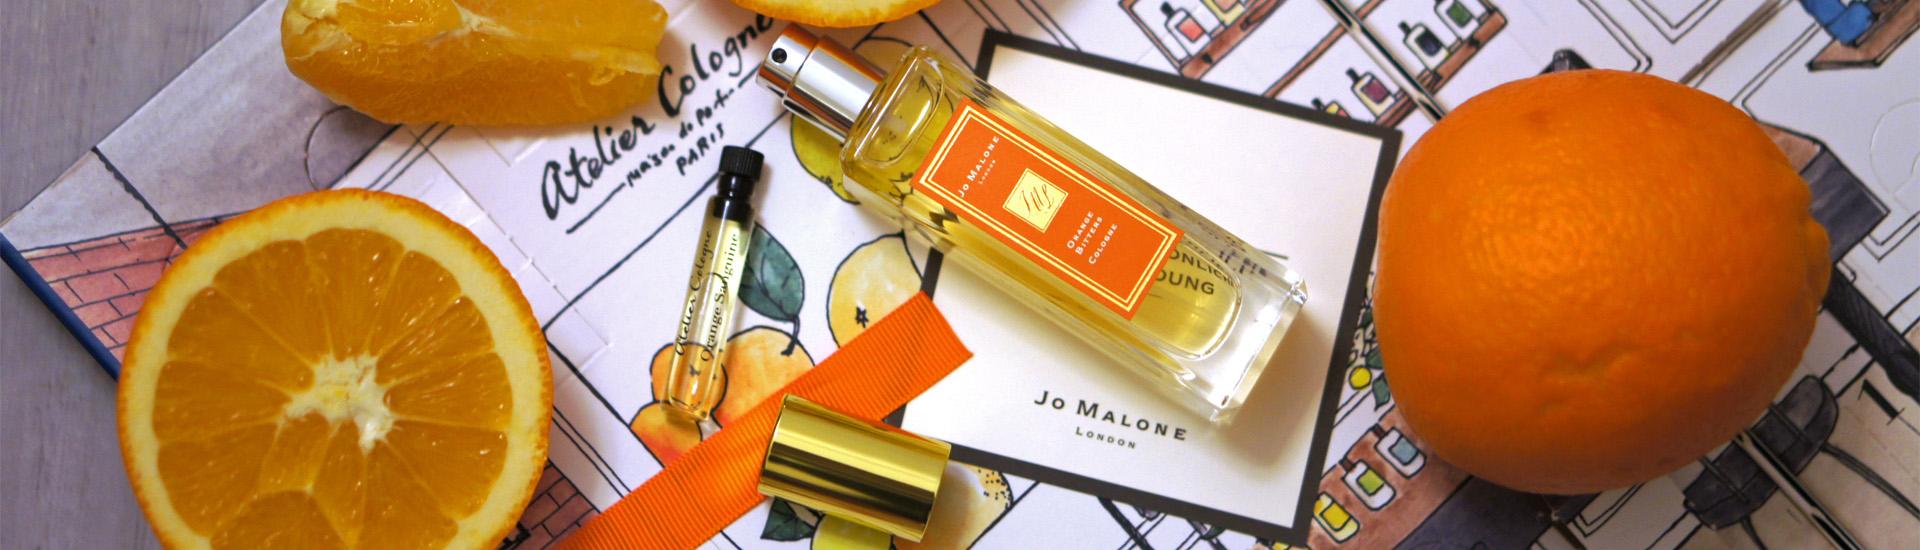 Битва парфюмерных апельсинов: Jo Malone London vs. Atelier Cologne